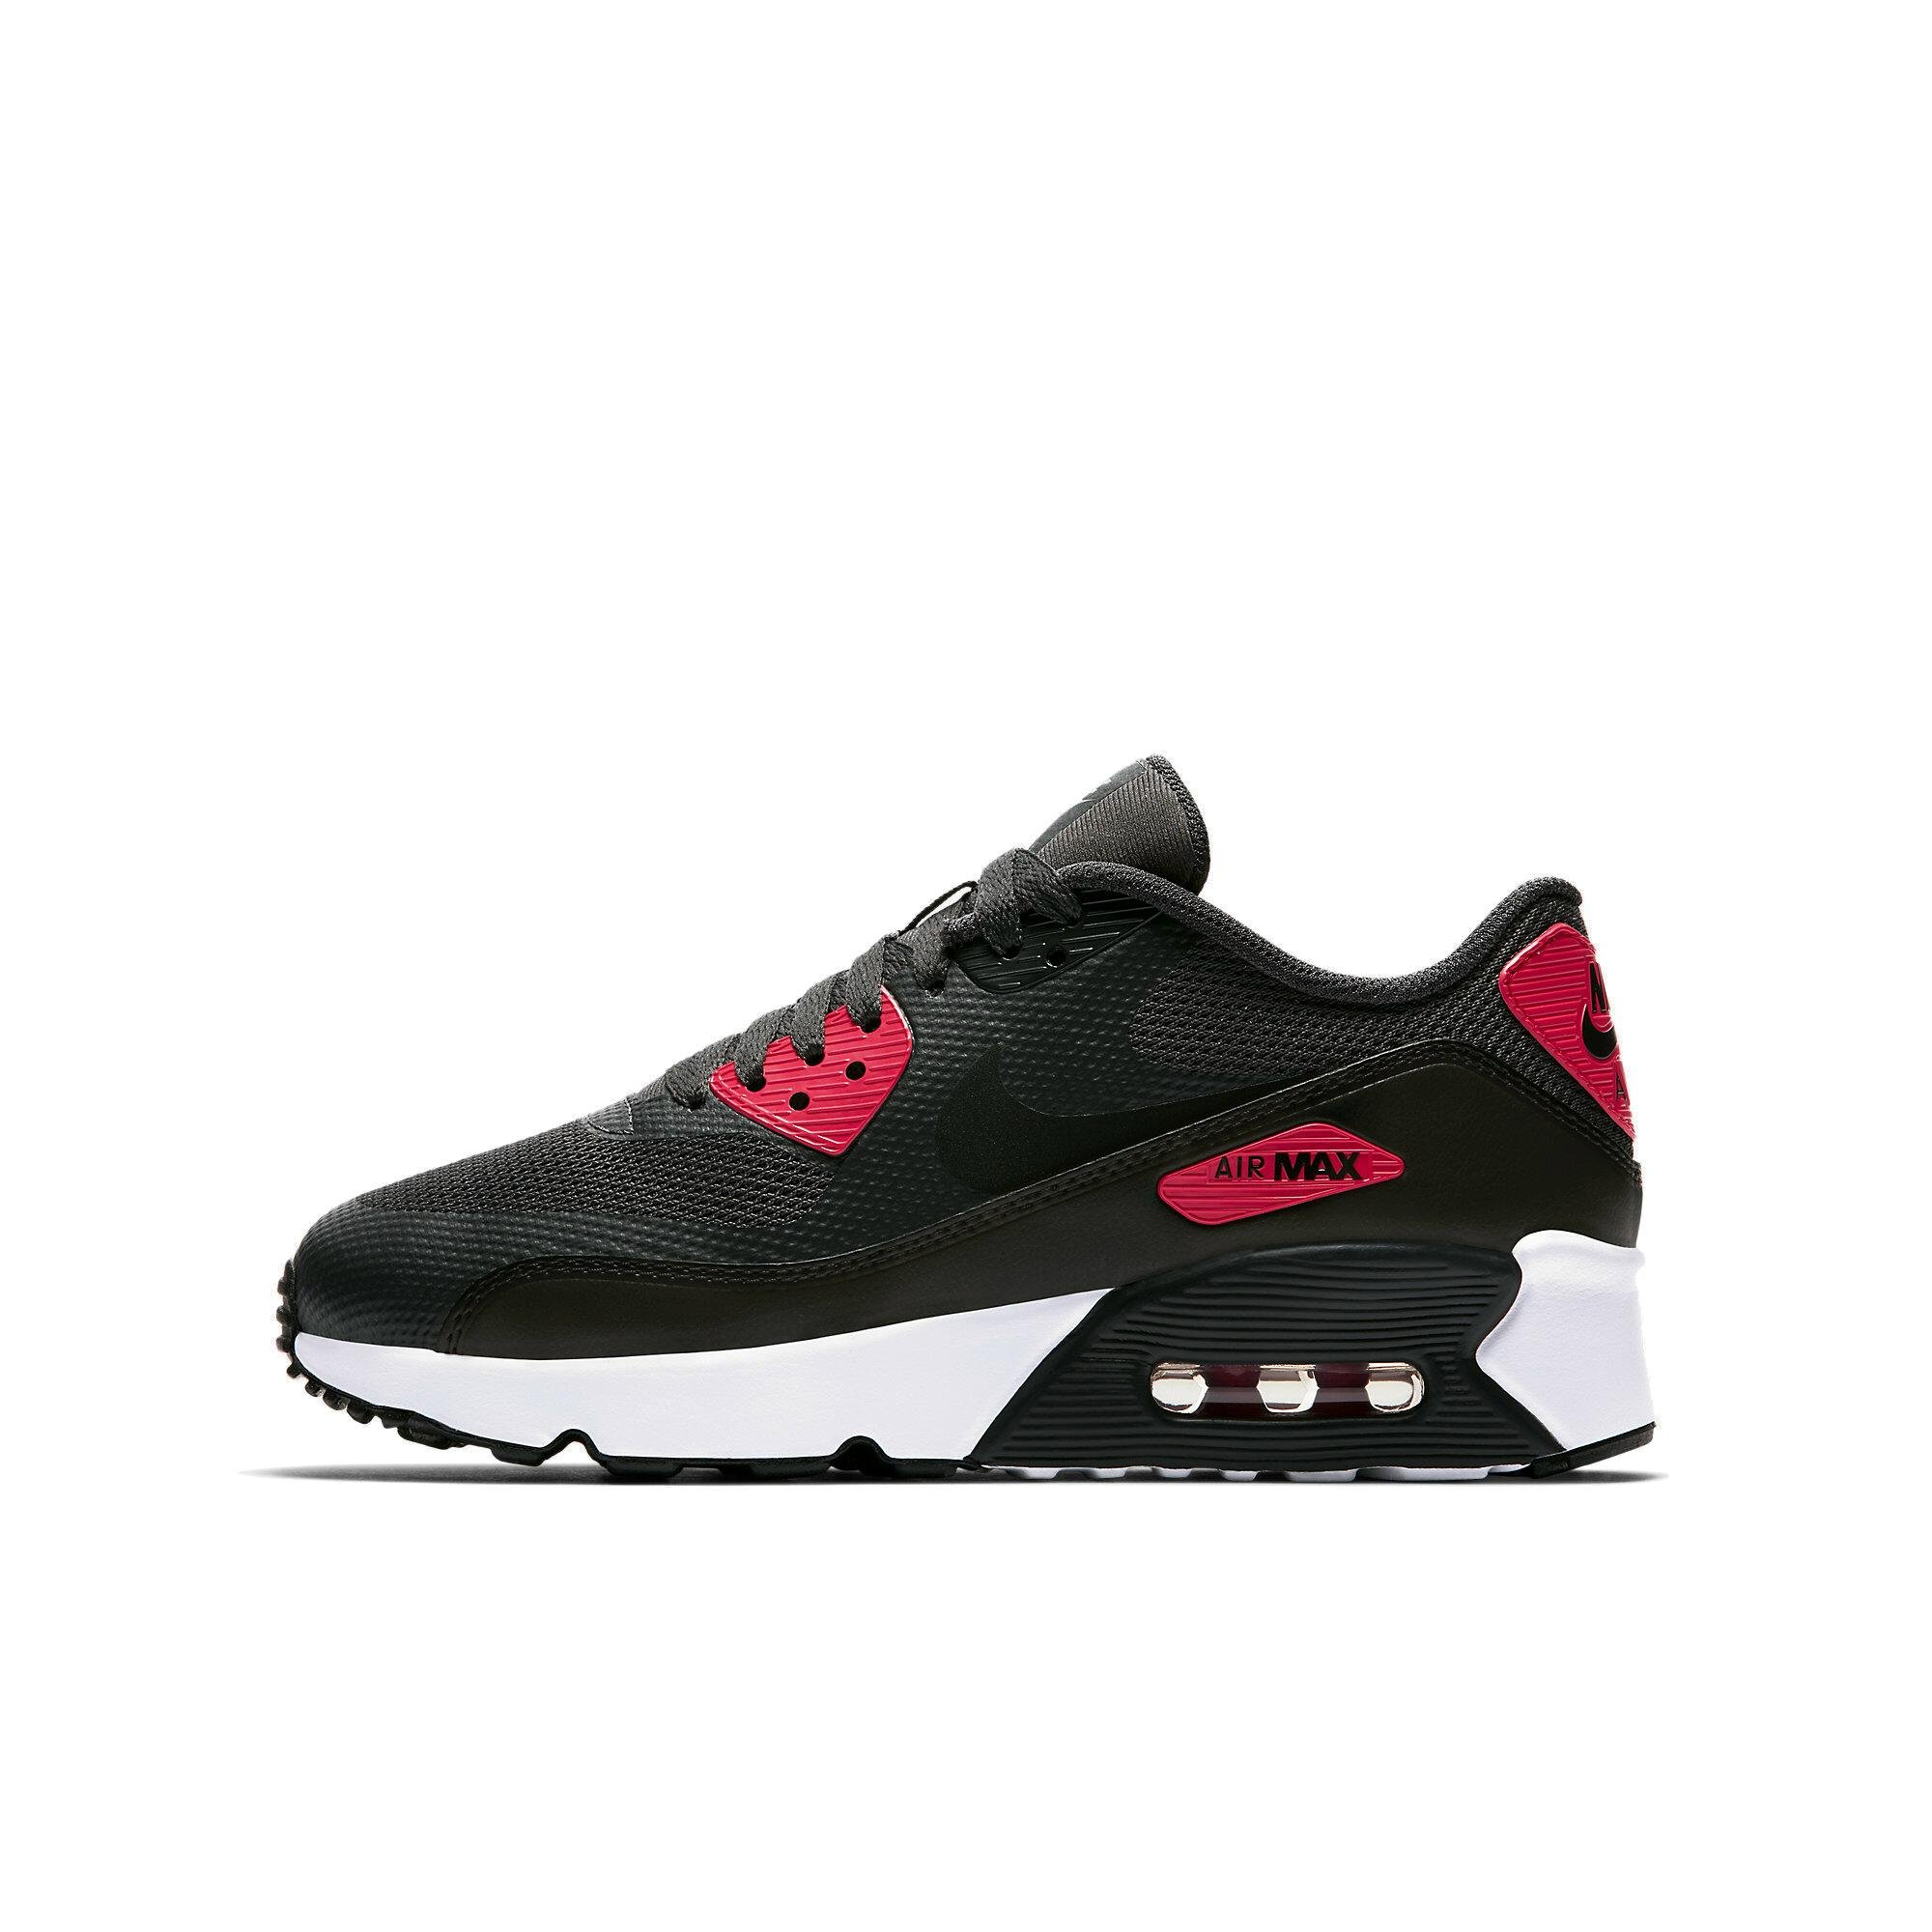 Nike Sportswear Boys Air Max 90 Ultra 2.0 Anthracite